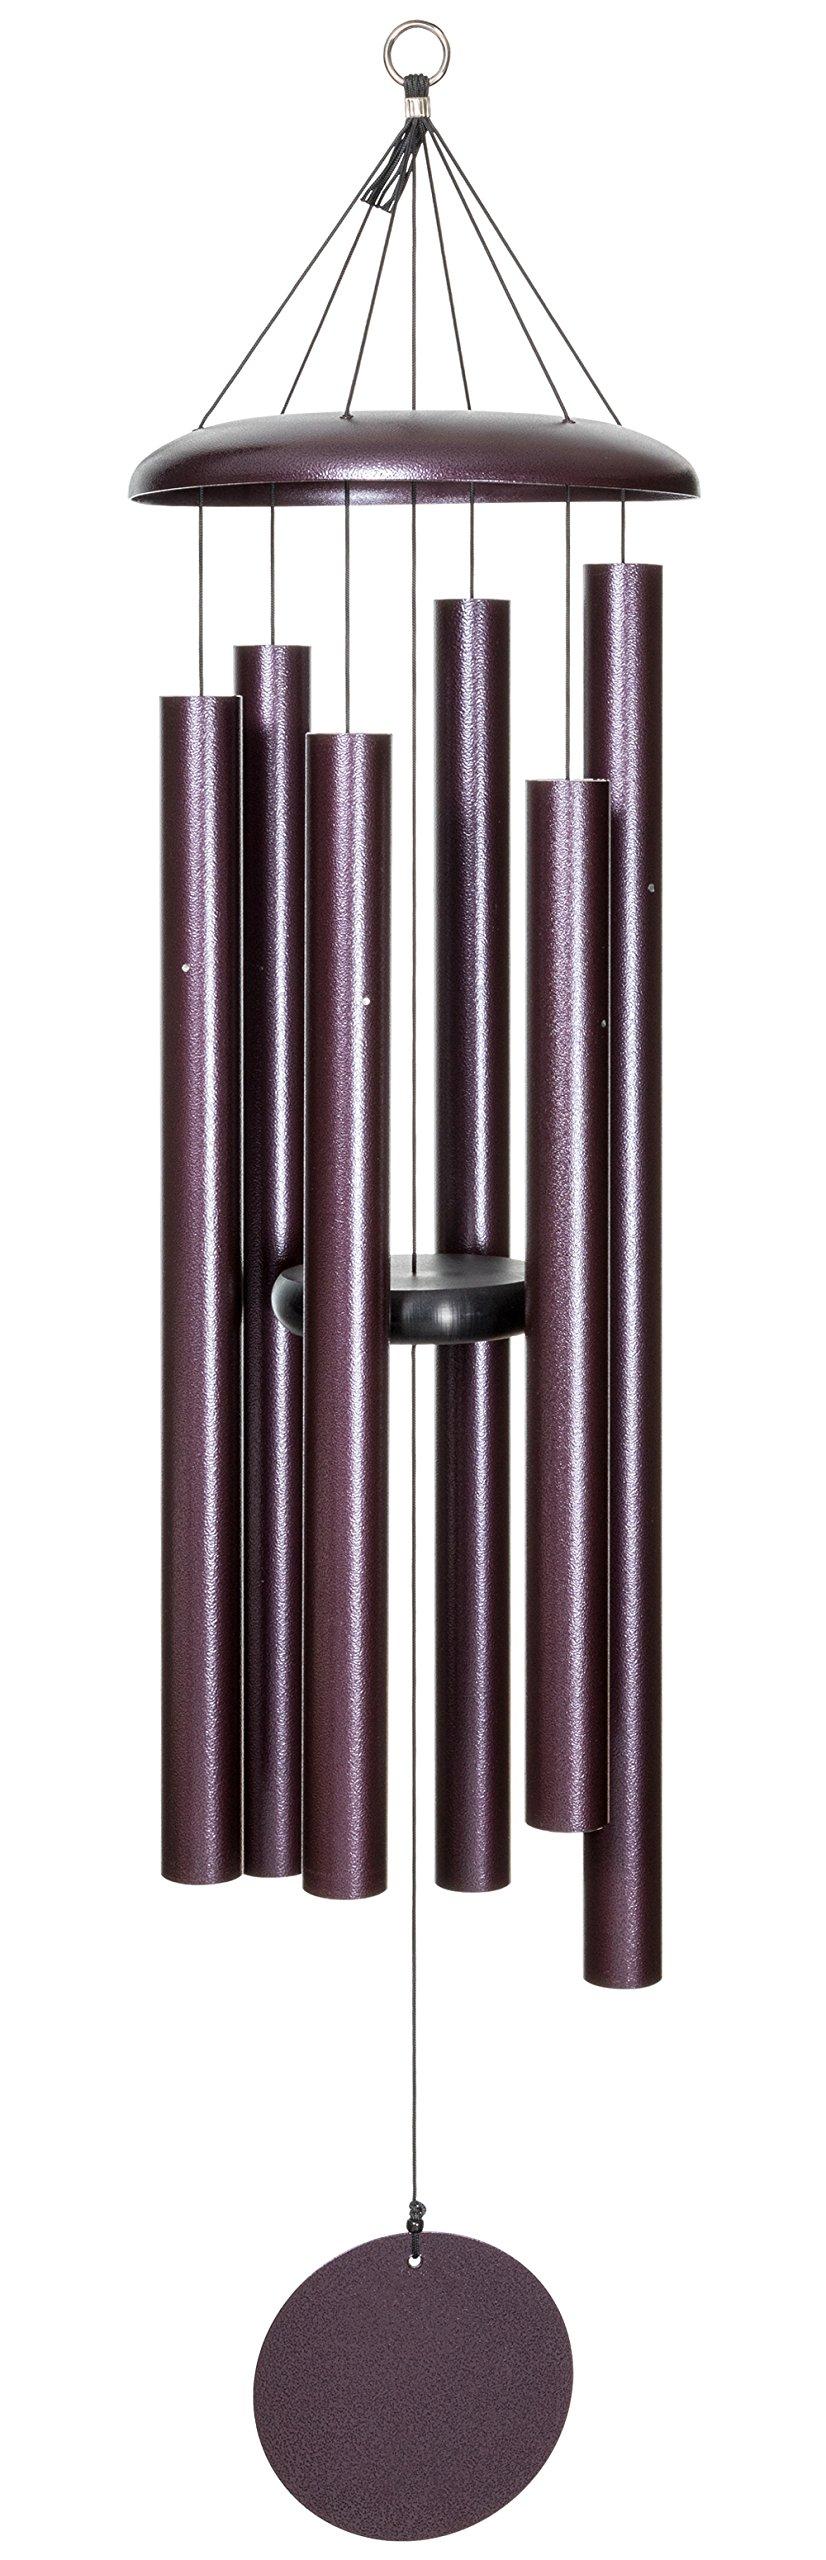 Corinthian Bells 50-inch Windchime, Plum